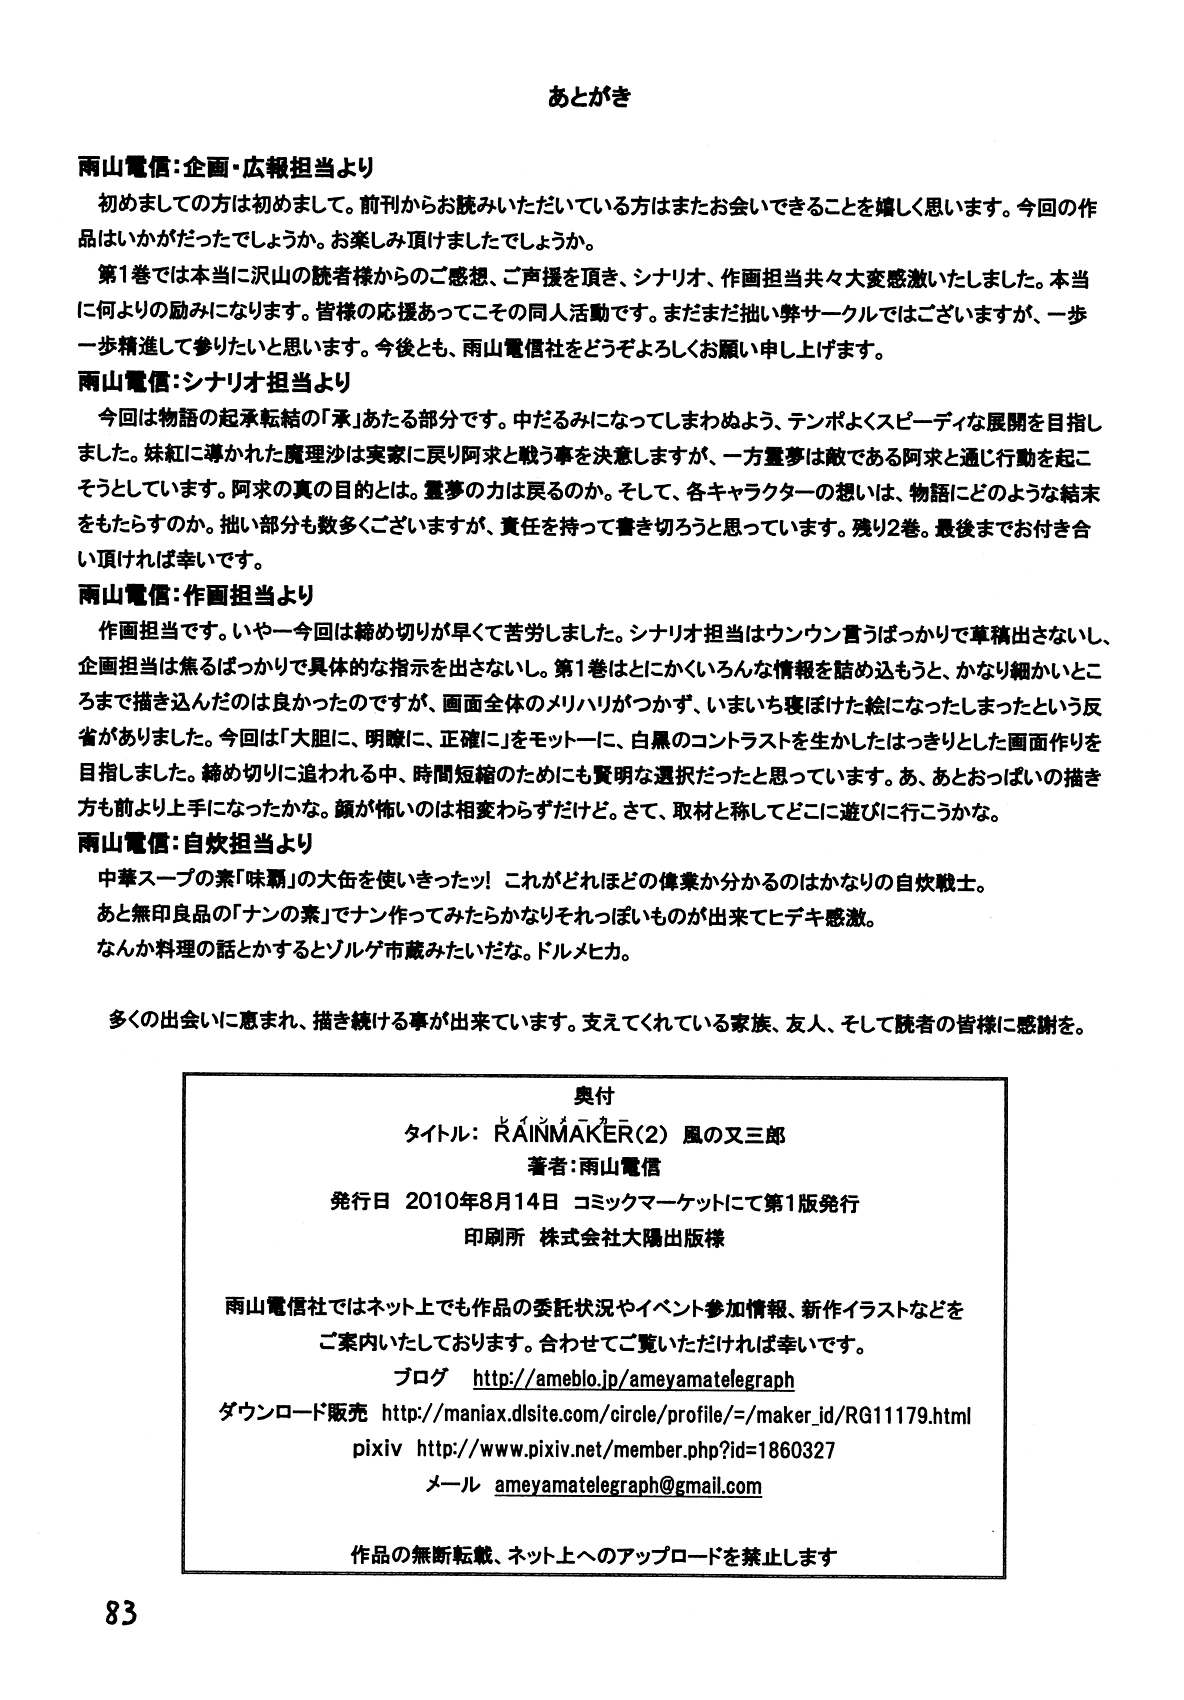 http://lector.patyscans.com/content/comics/ameyama-denshin_59ff0a9b2a4b8/2-0-rainmaker-2_5b551d58c5e6d/000.jpg